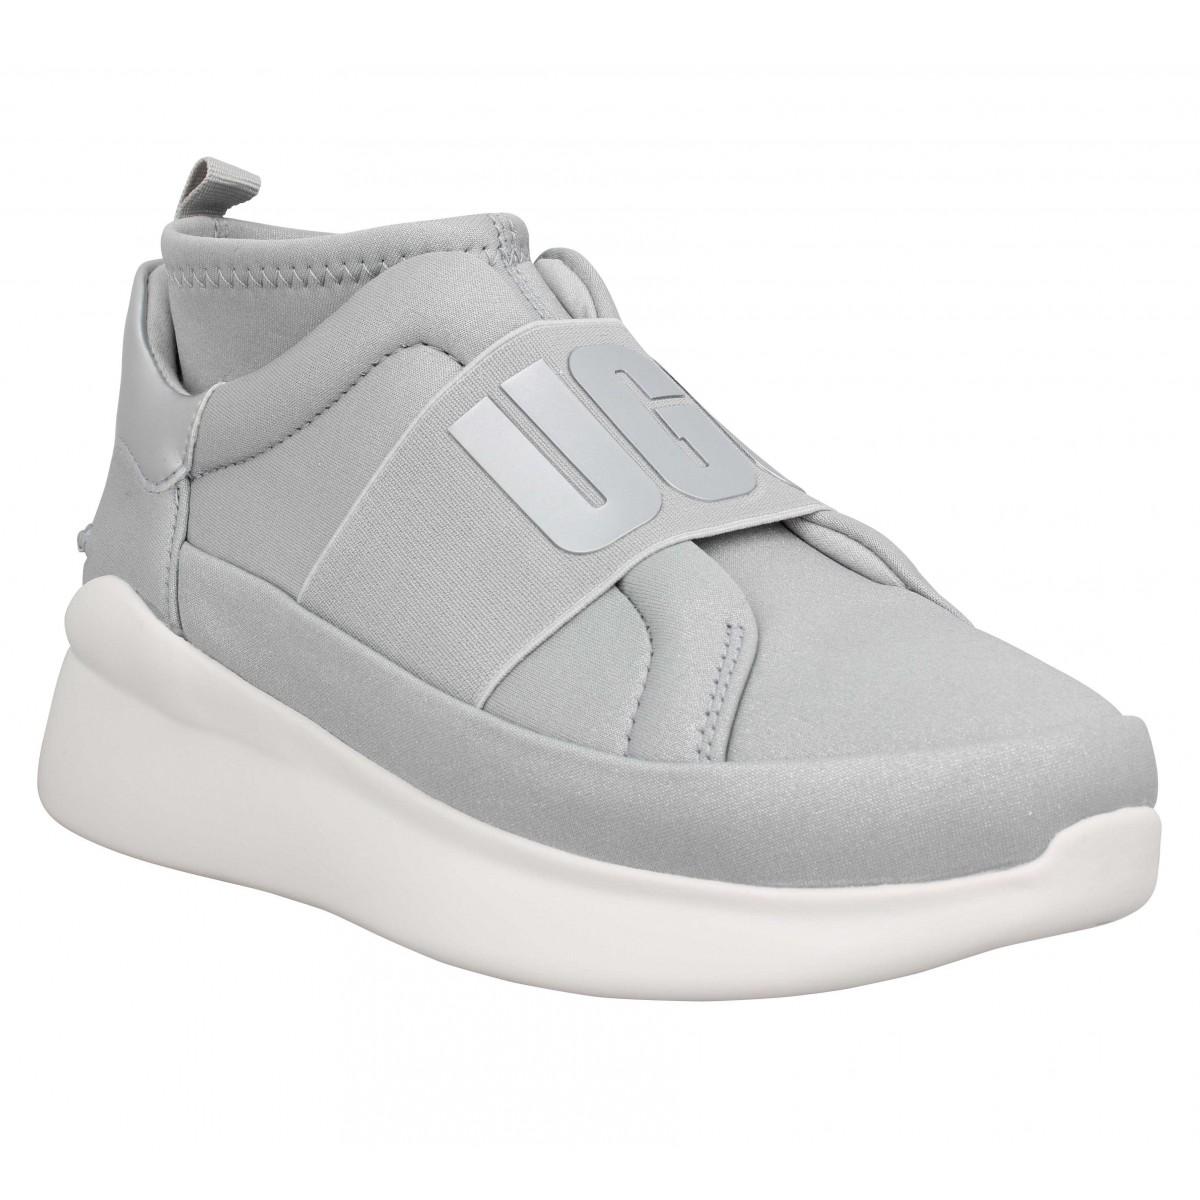 Ugg Australia Marque Ugg Neutra Sneaker...